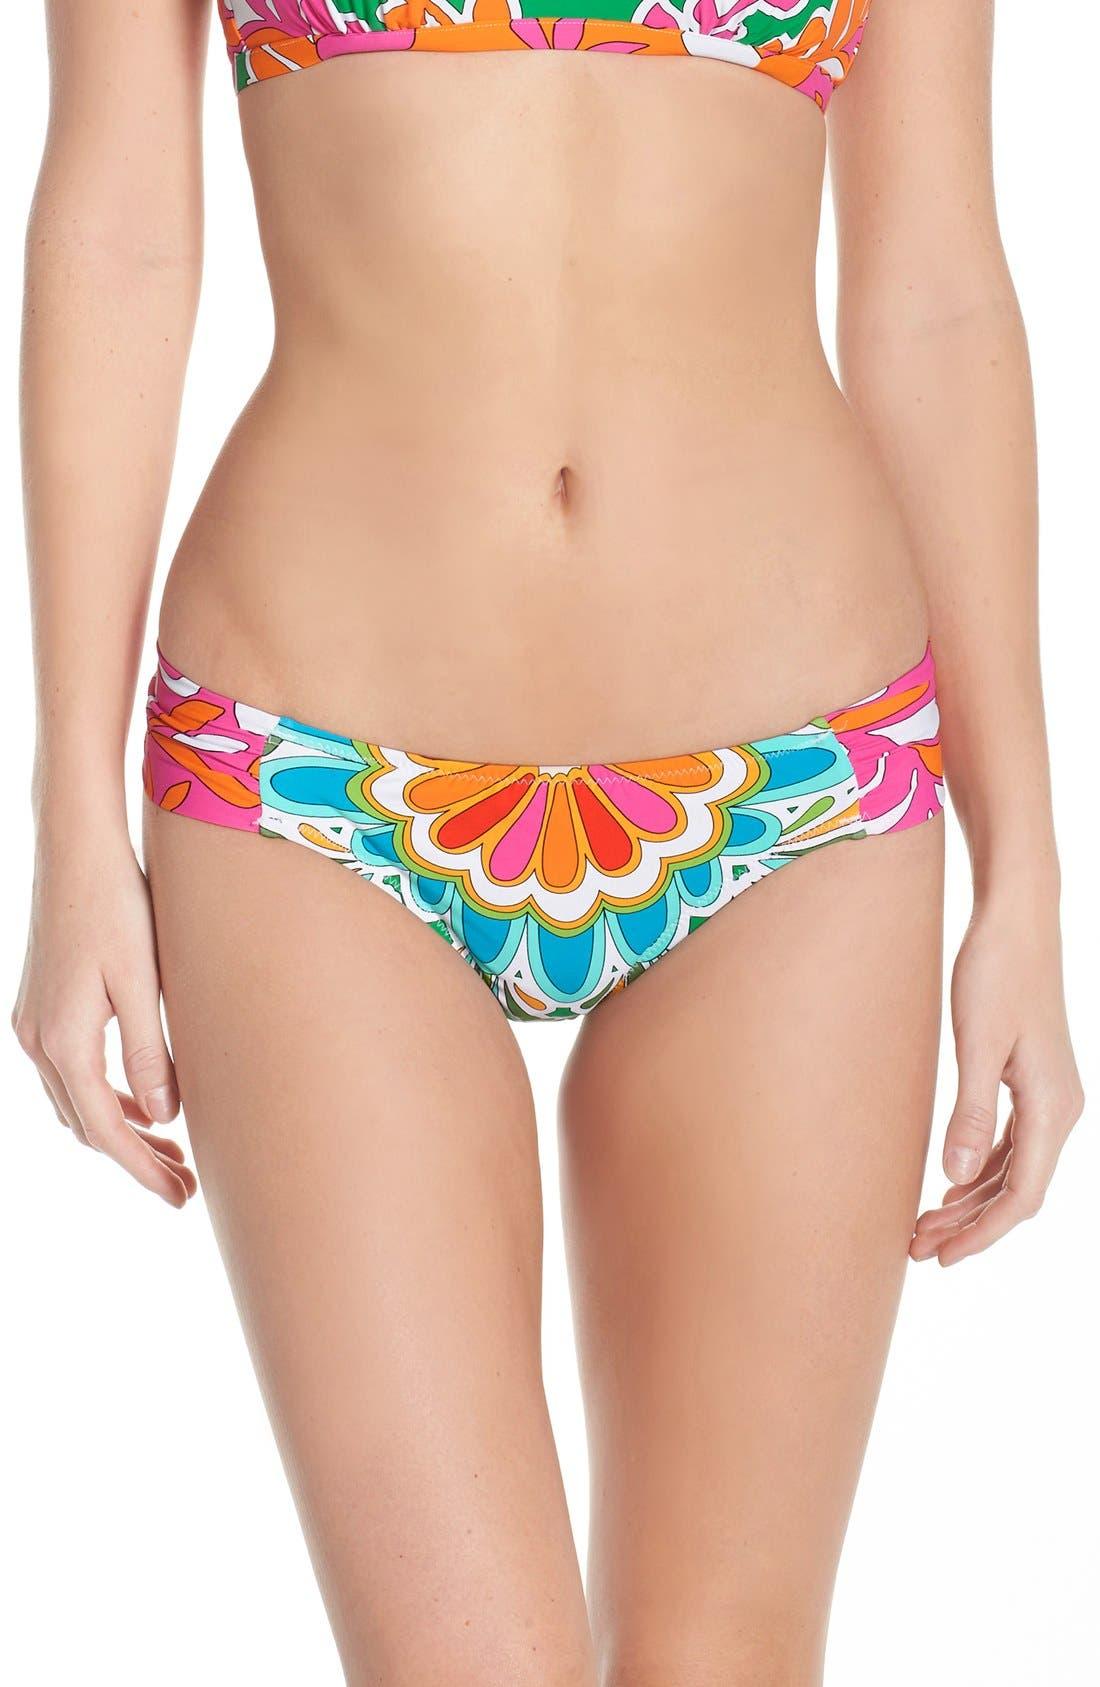 Alternate Image 1 Selected - Trina Turk 'Tamarindo' Hipster Bikini Bottoms